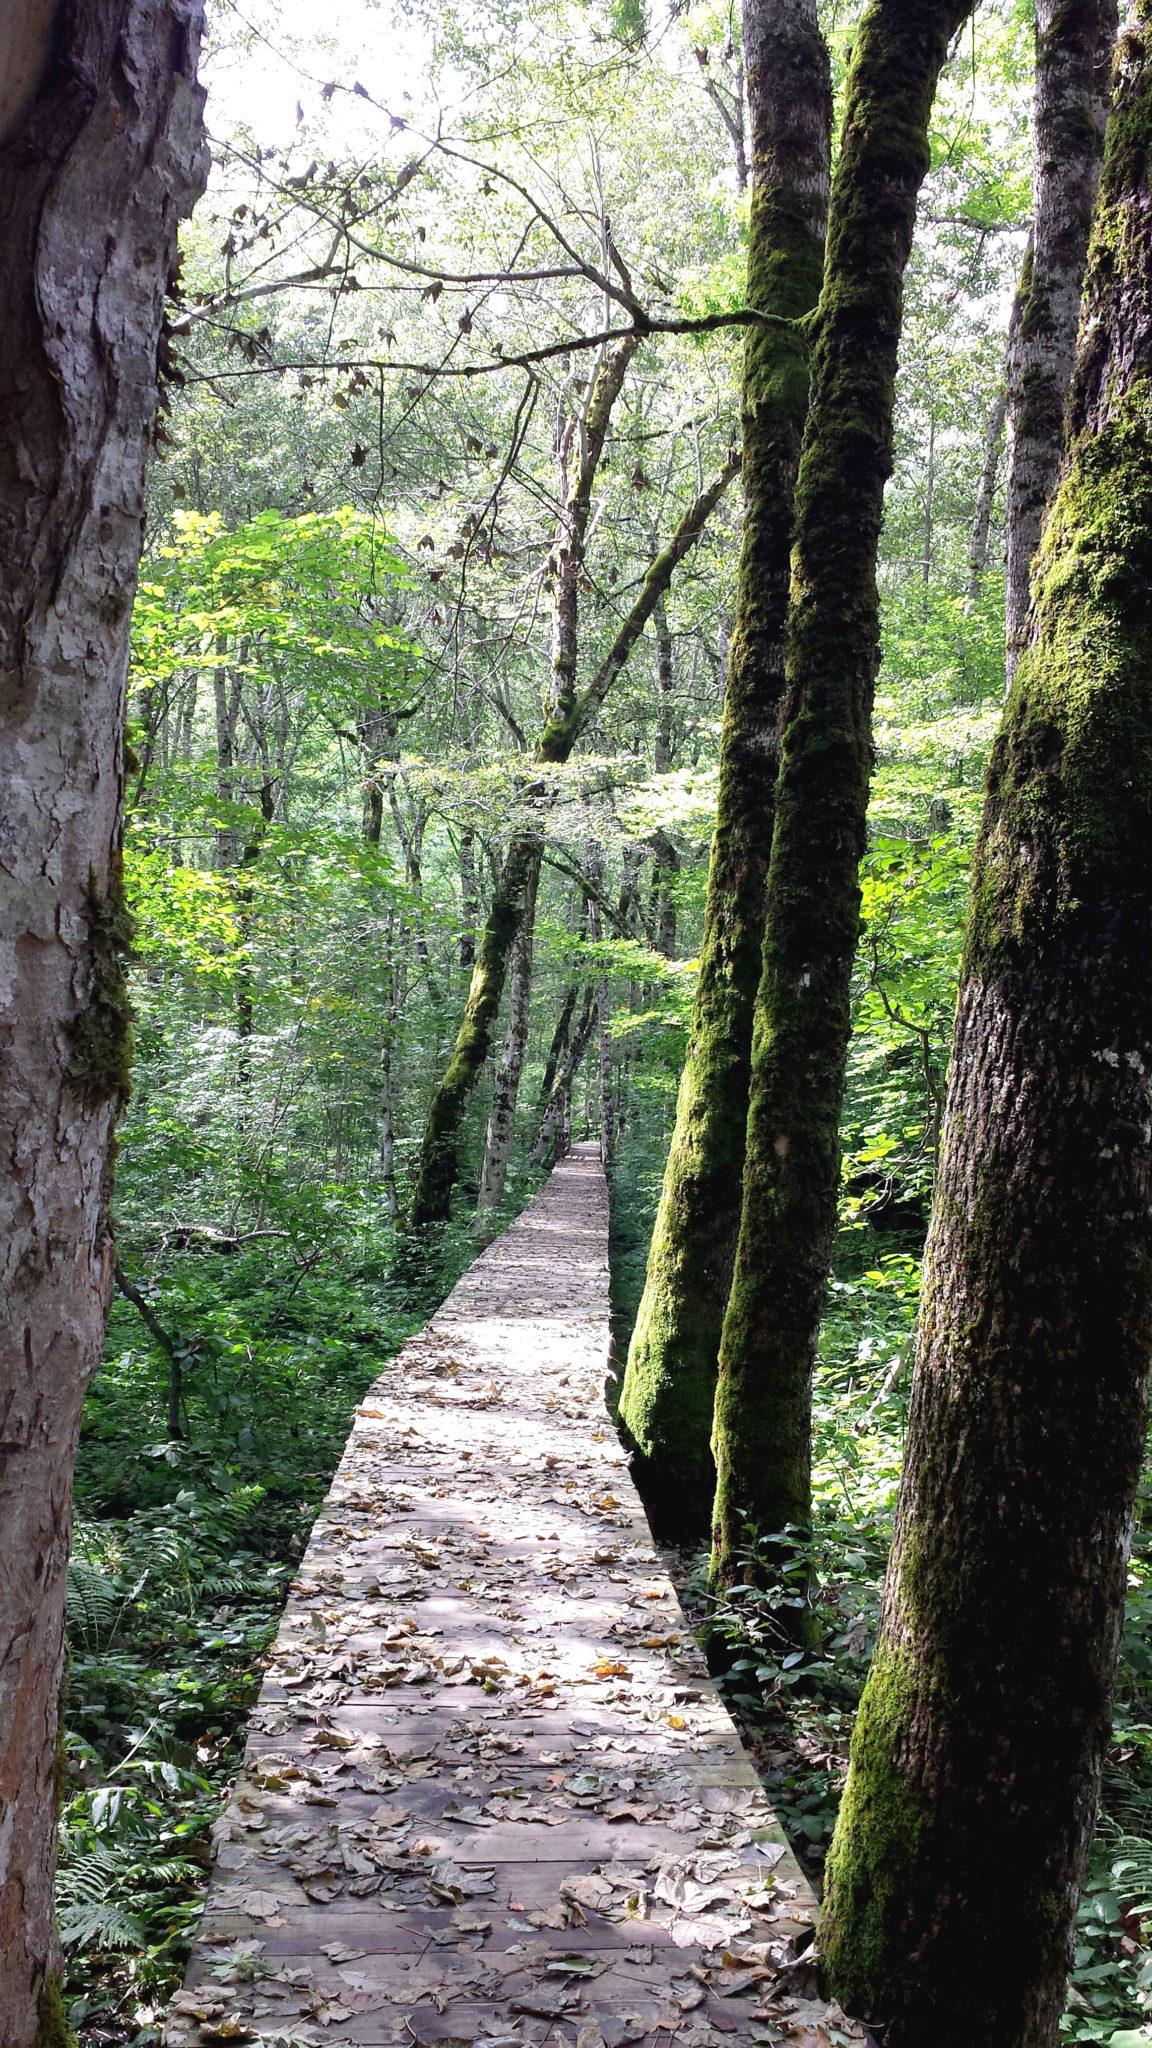 Hema_Montenegro_parc_national_biogradska_gora_forest_travel_voyage_blog17